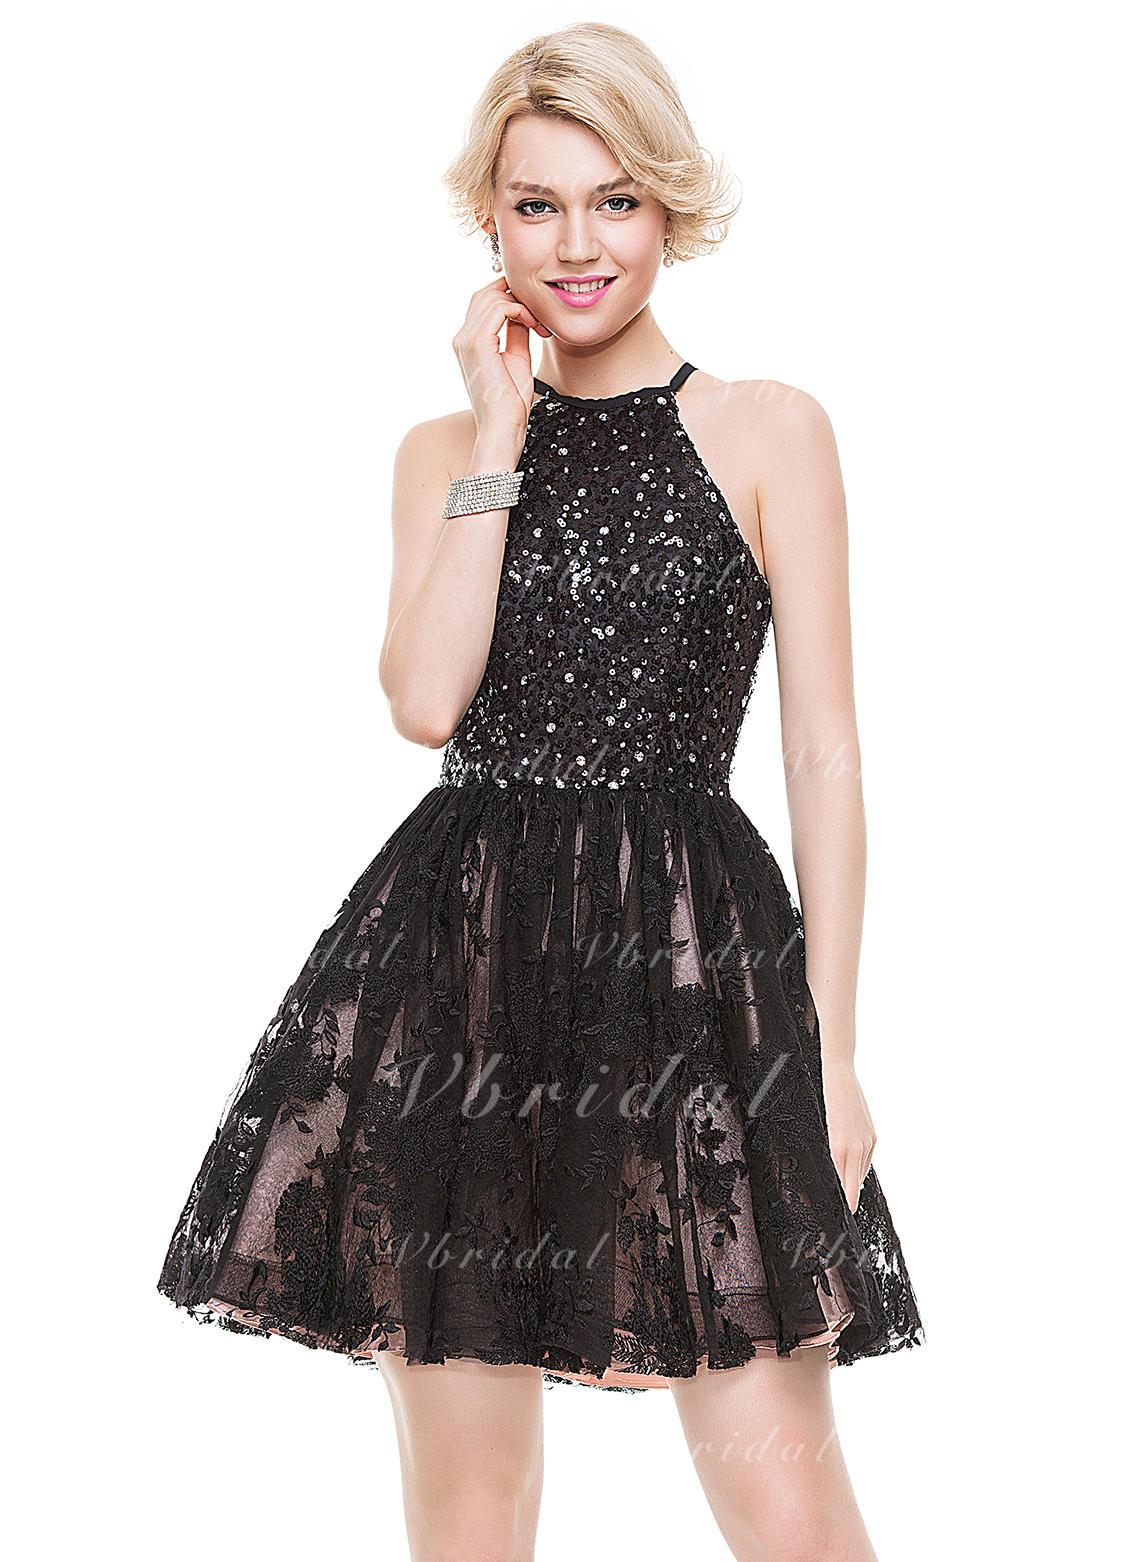 487f7143 A-formet/Prinsesse Scoop Hals Kort/Mini Tyll Blonder Ballkjole med  Profilering paljetter (022087601)